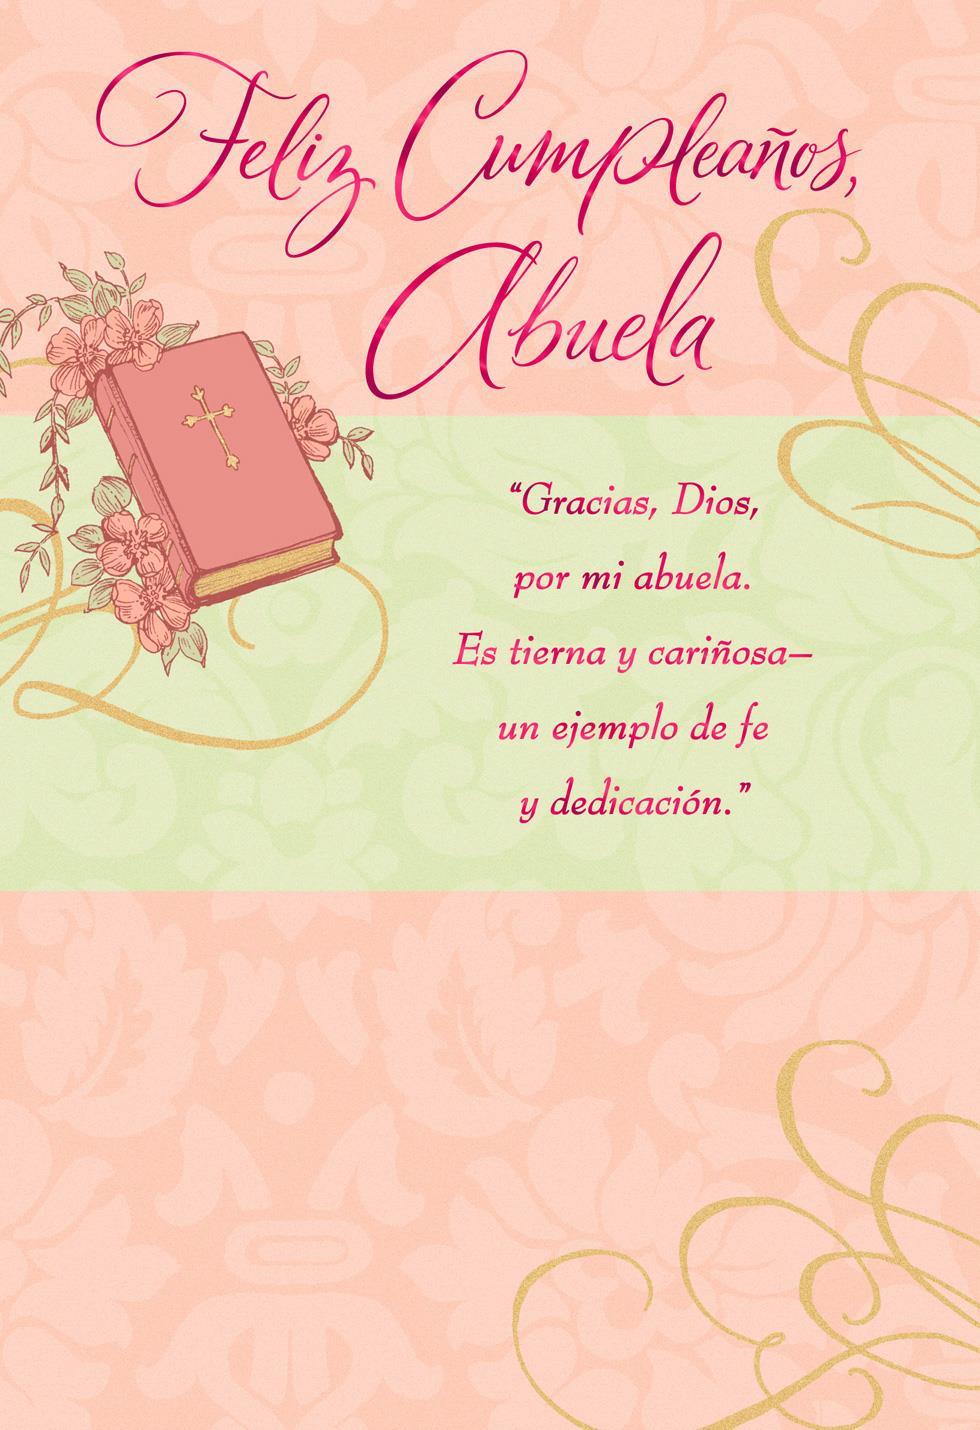 So Blessed Spanish Language Grandmother Religious Birthday